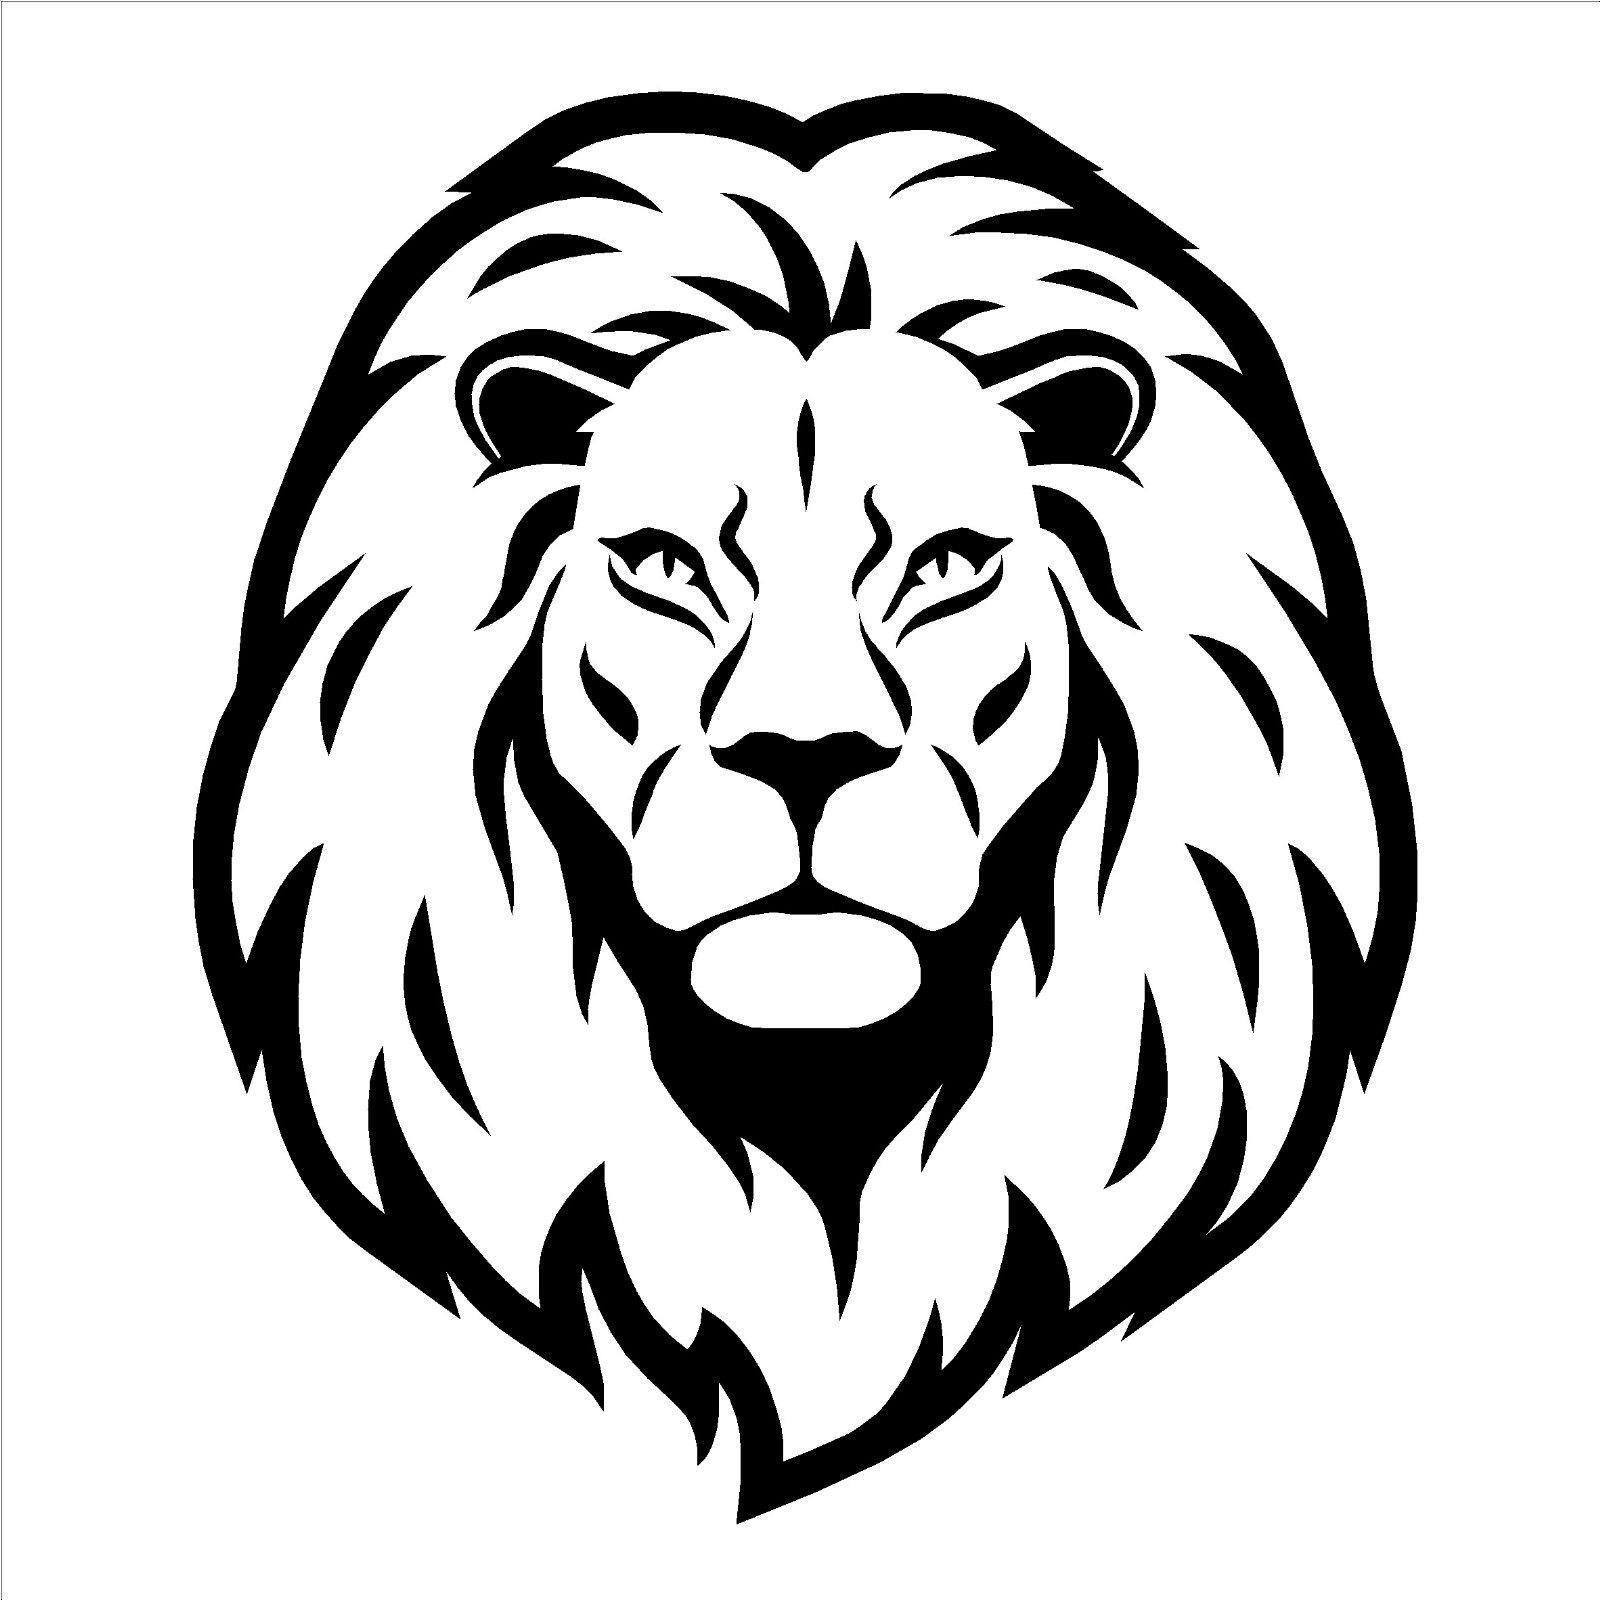 Line Drawing Lion Head : Lion head vinyl wall art sticker decal animal themed